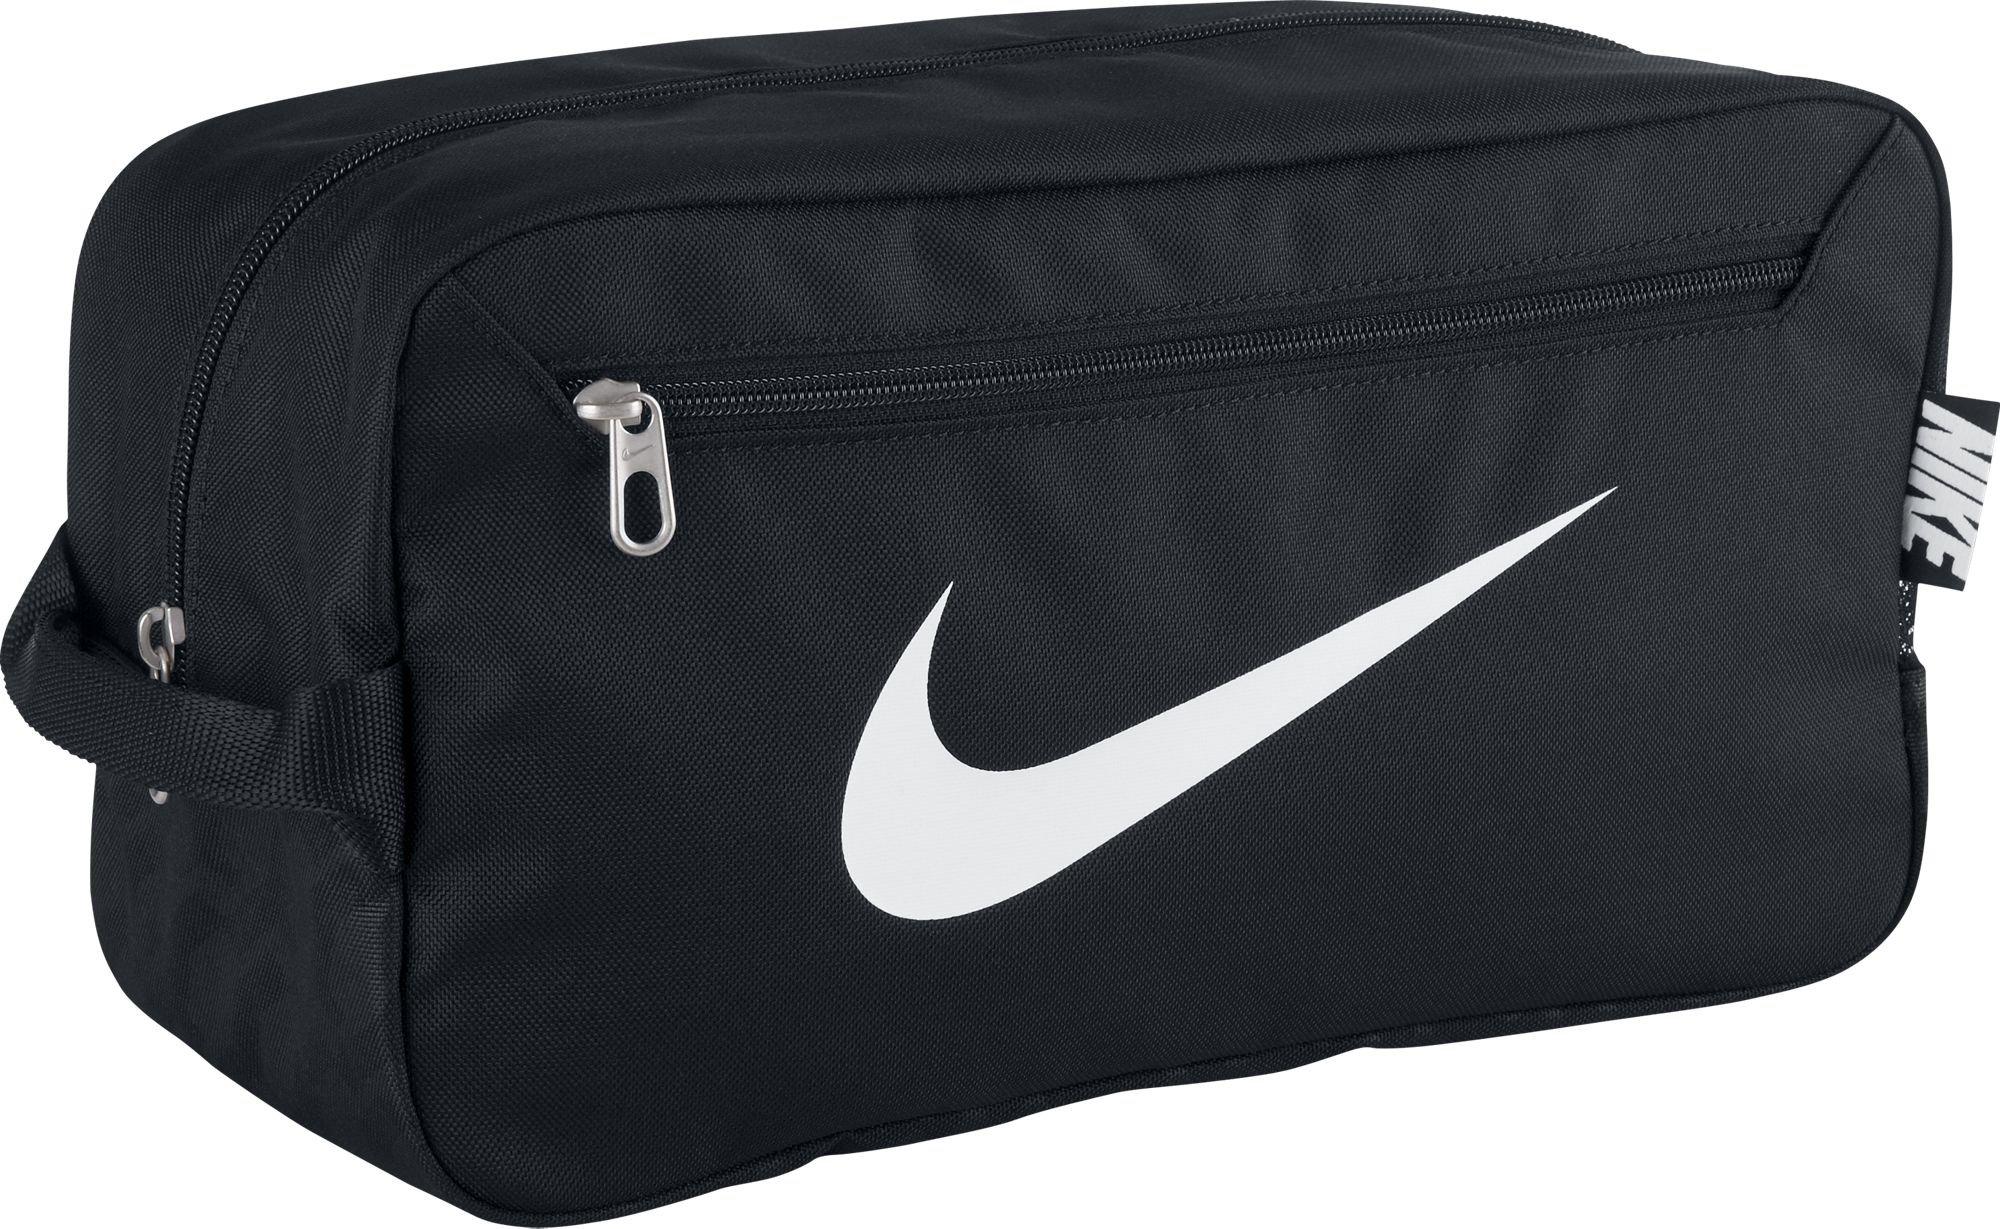 Nike Men's Brasilia 6 Shoe Bag - Black/Black/White, One Size by Nike